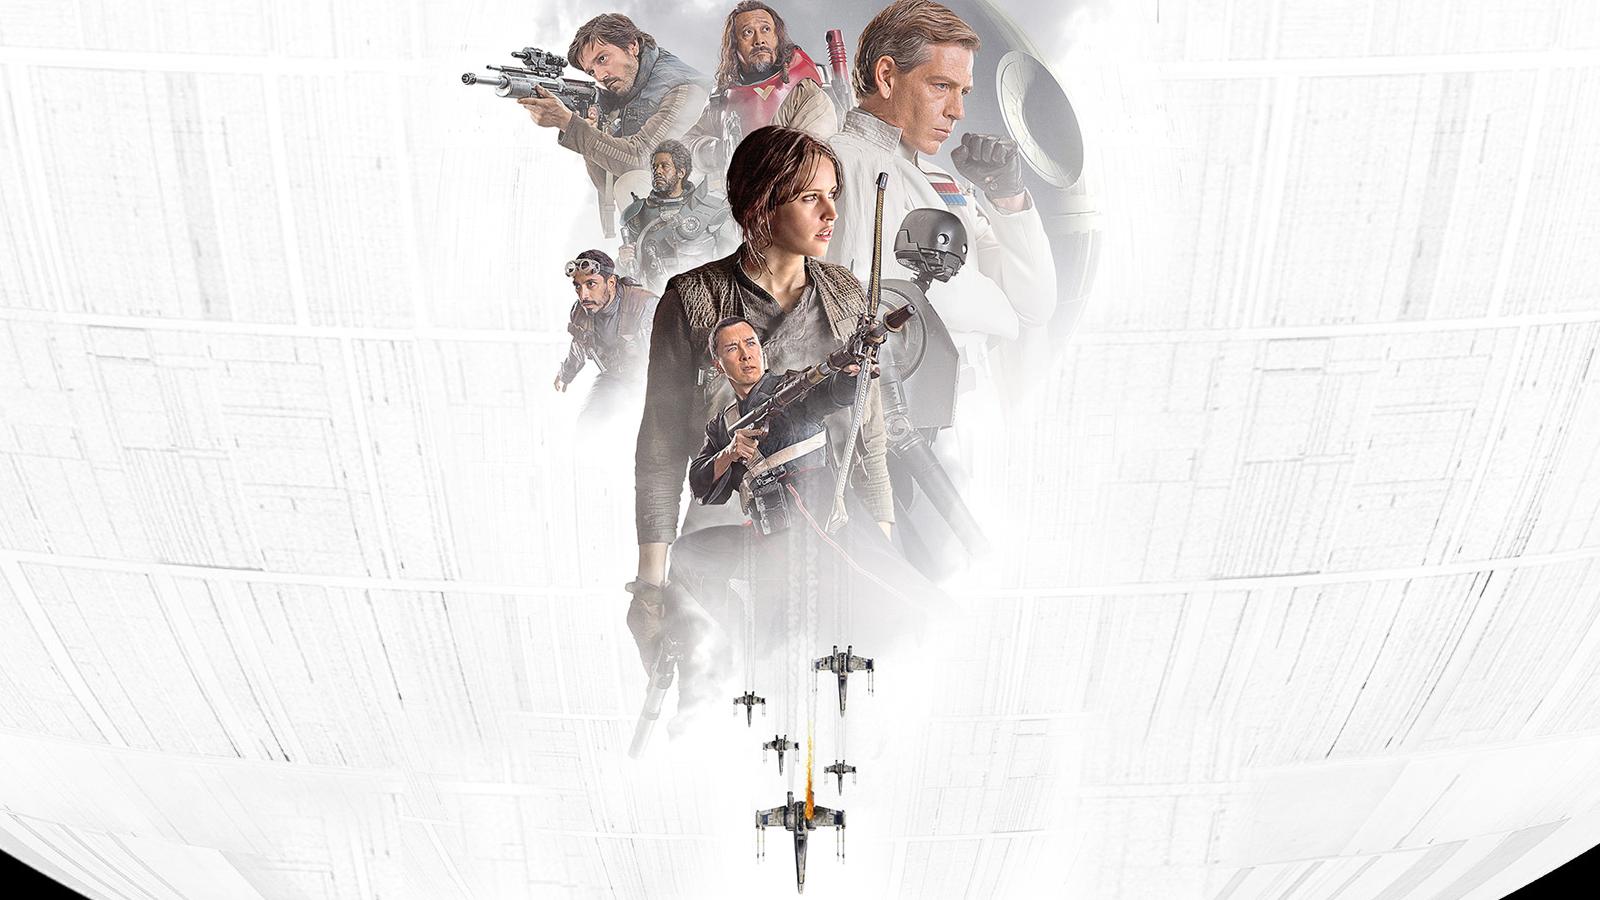 General 1600x900 Star Wars Rogue One: A Star Wars Story Felicity Jones movies Death Star Jyn Erso